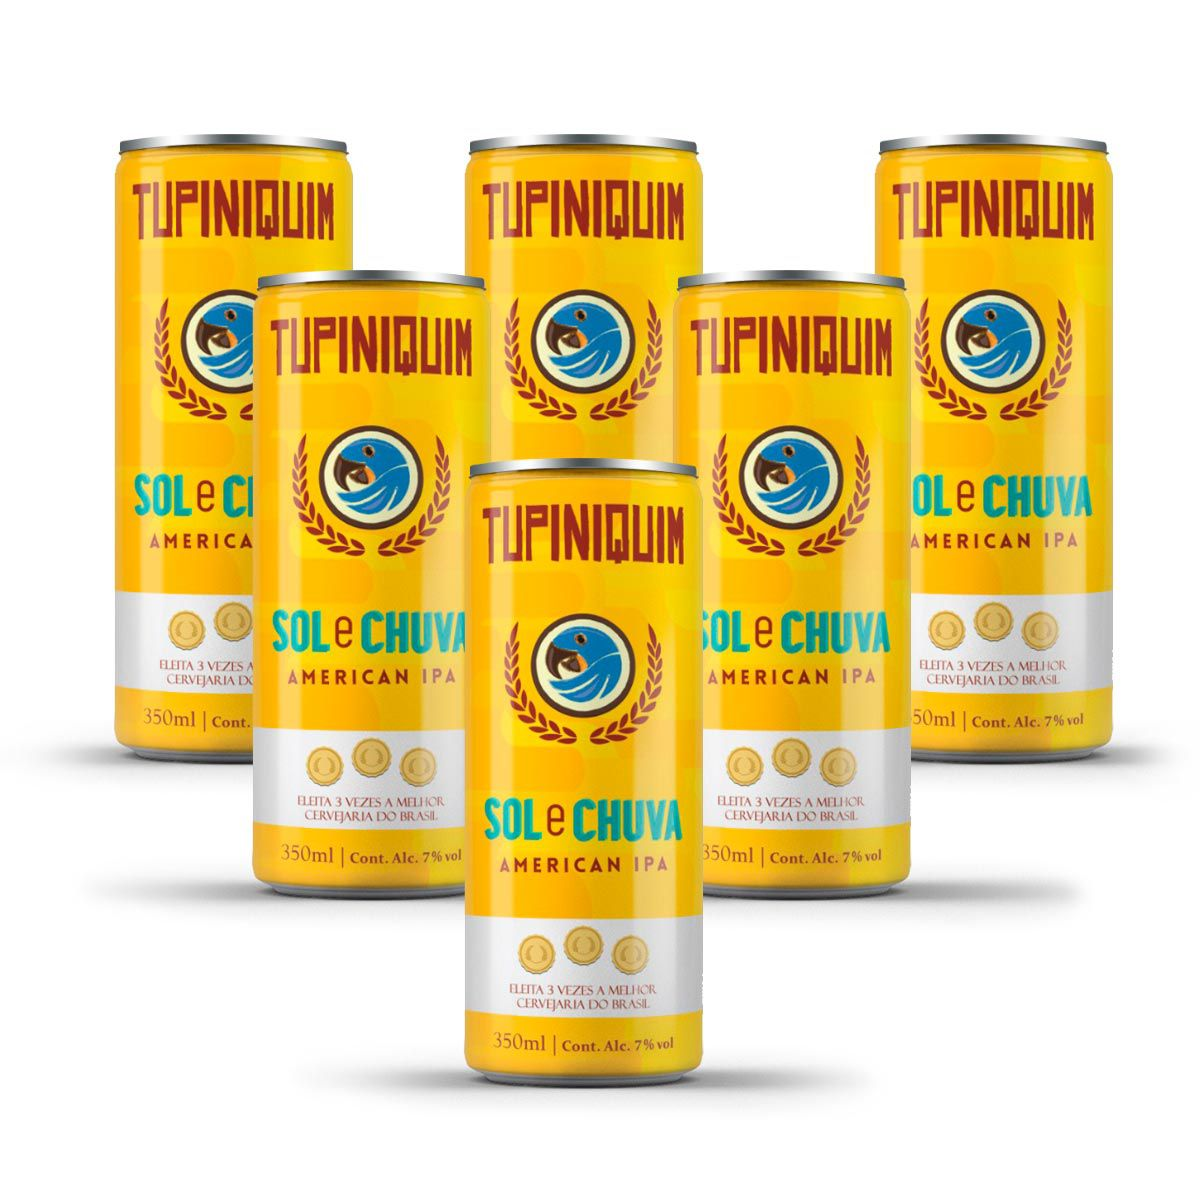 Pack Tupiniquim Sol e Chuva American IPA 6 cervejas 350ml